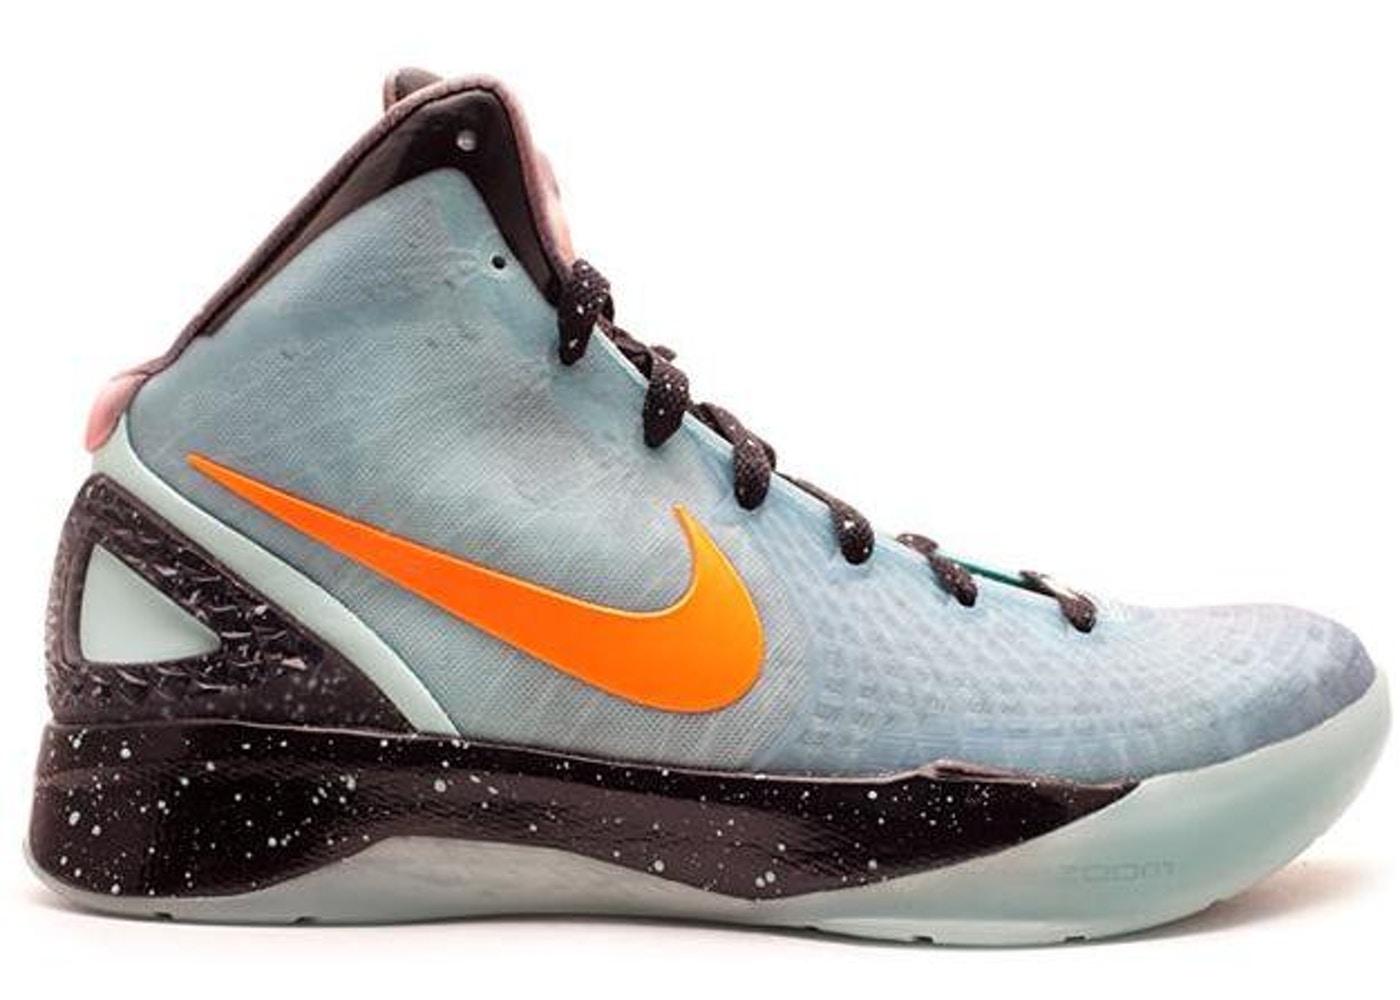 Basketball Shoes Store: Nike Zoom Hyperdunk 2010 (White